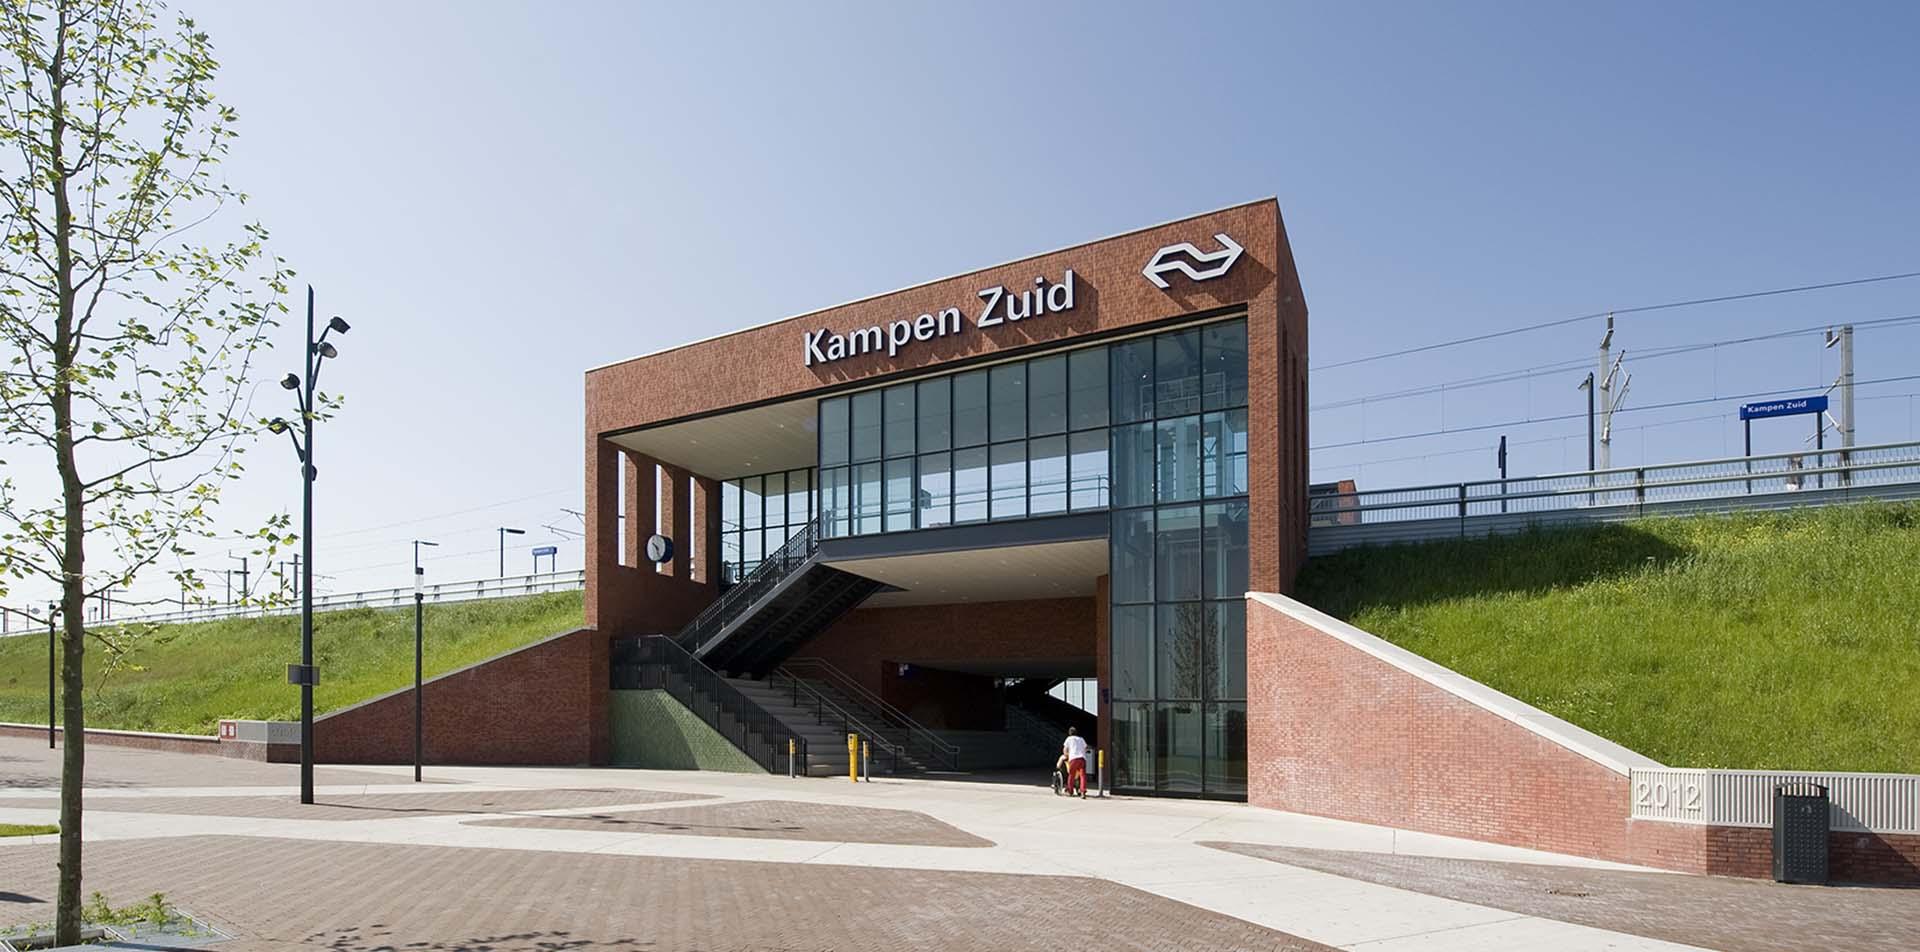 station Kampen Zuid